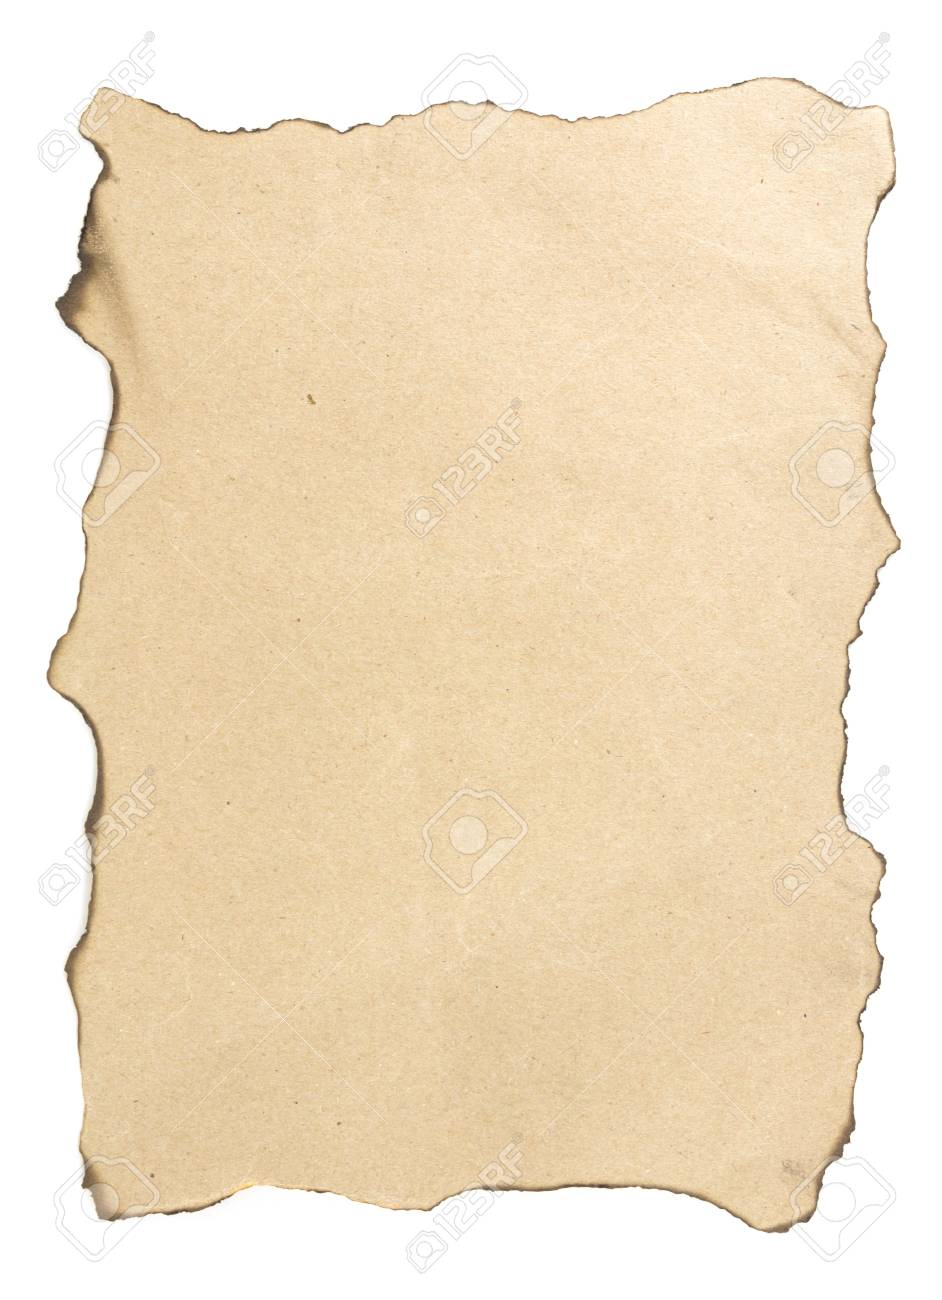 Paper is burnt Stock Photo - 16674163